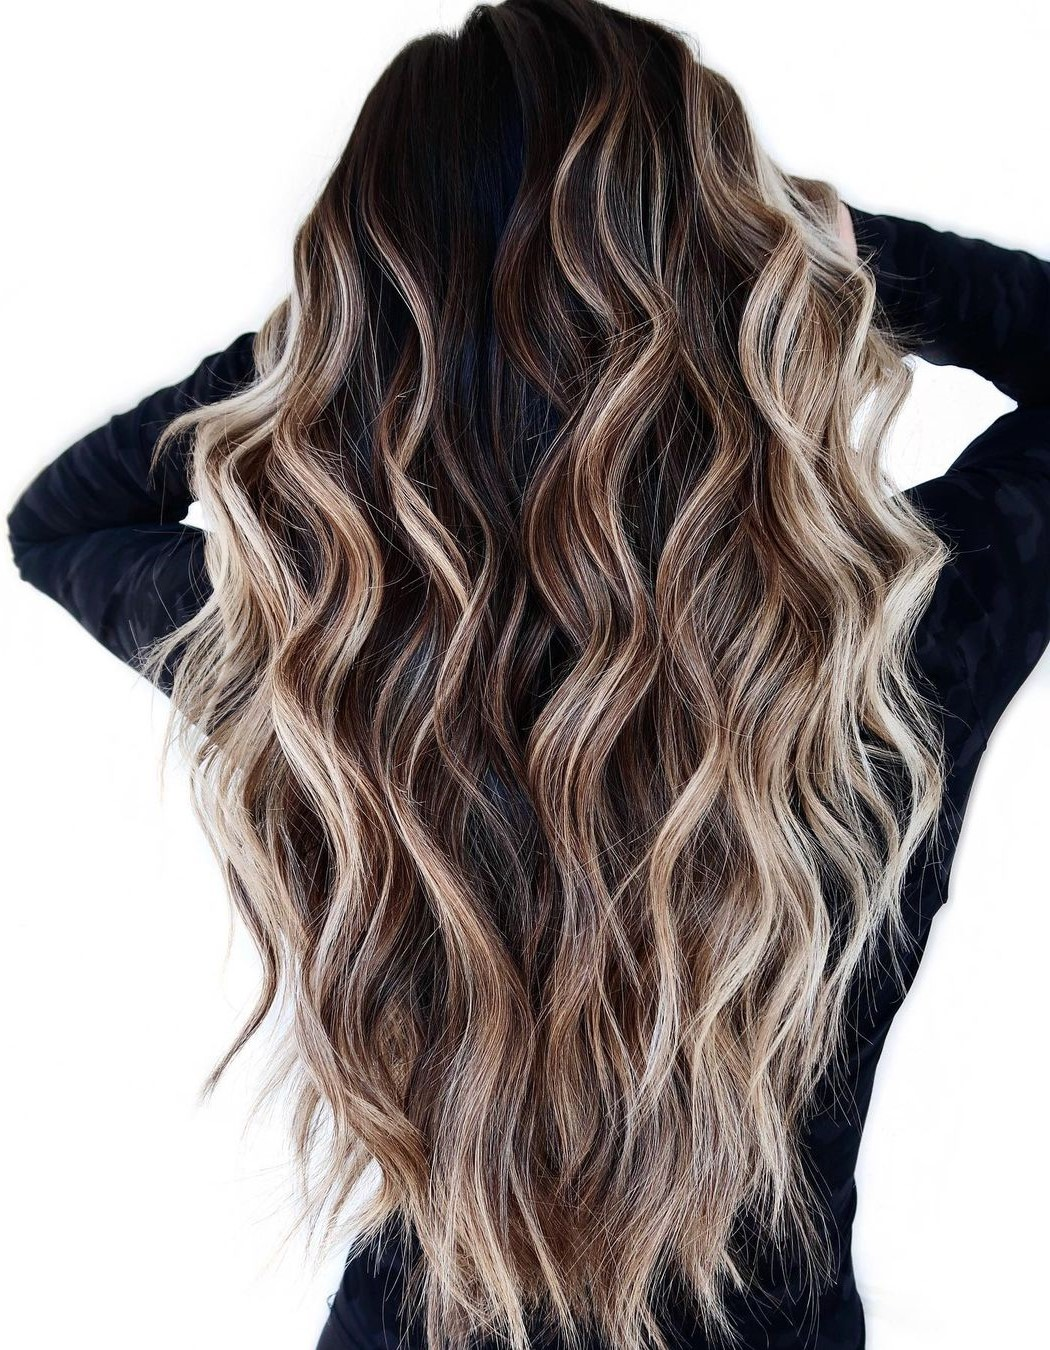 V-Cut Dark Hair with Highlights